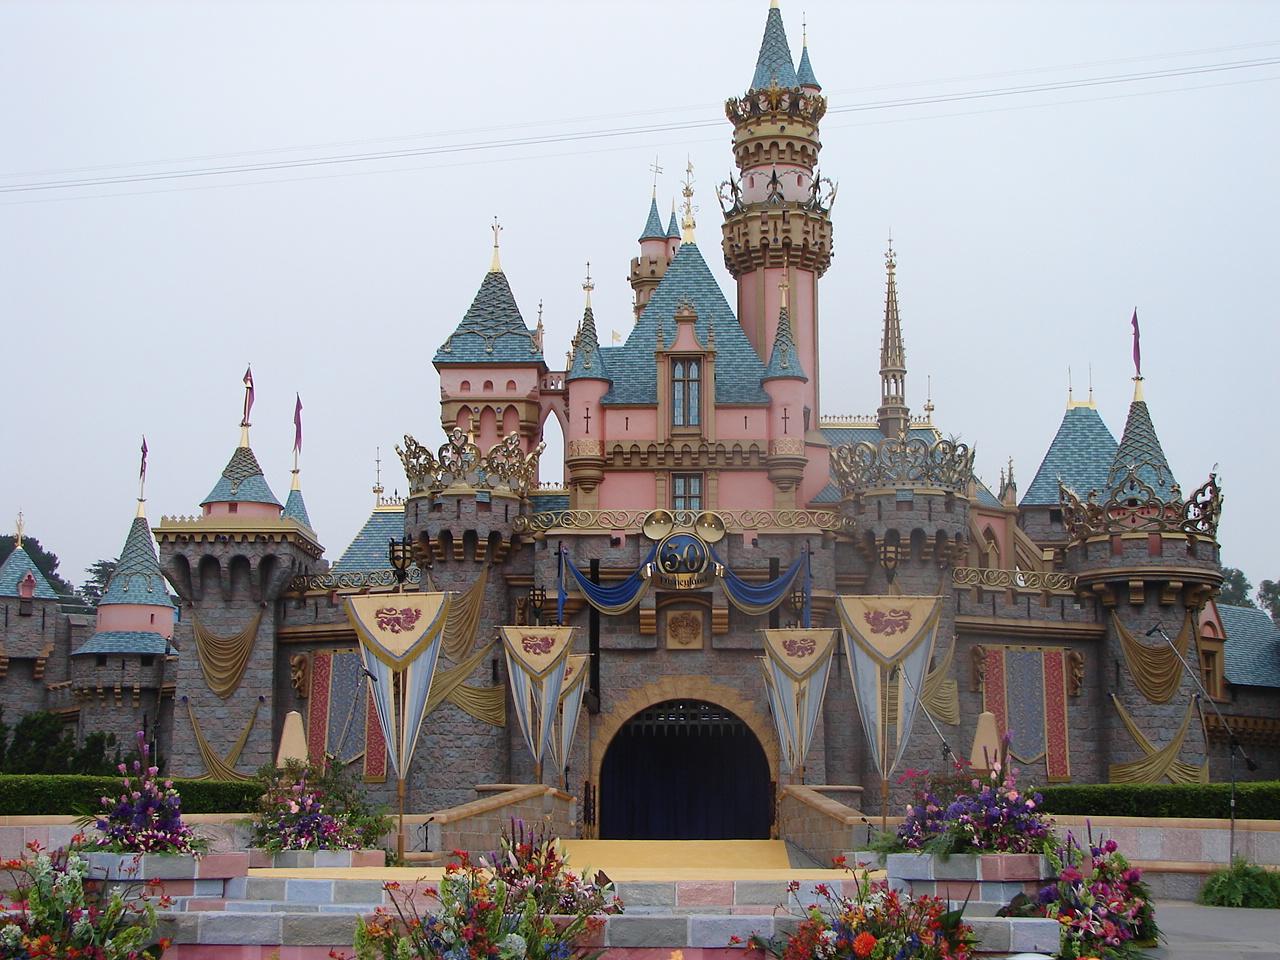 Disneyland Park, Walt Disney